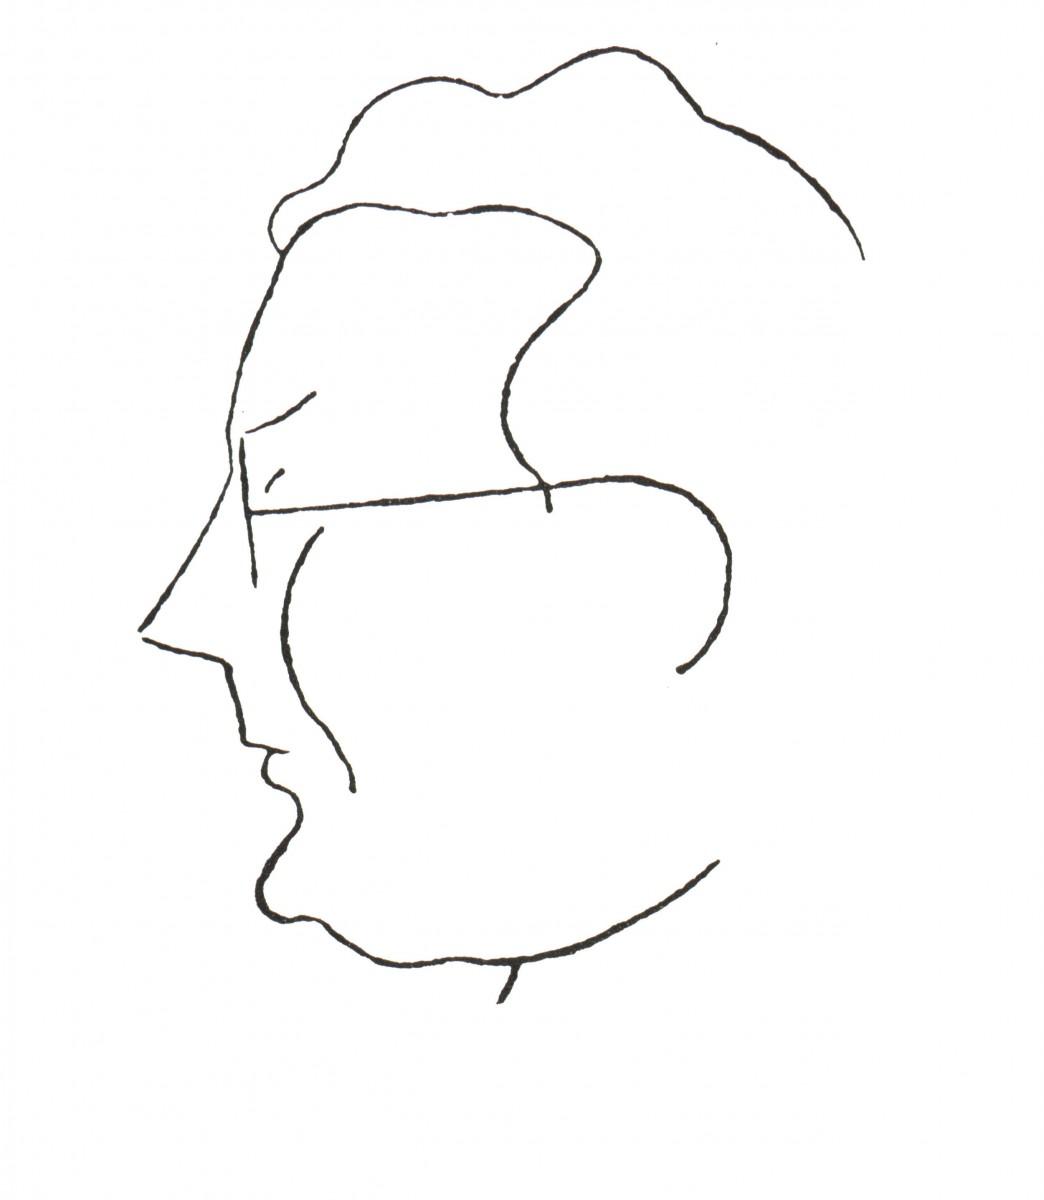 Caricatura de Maside de Plácido Castro